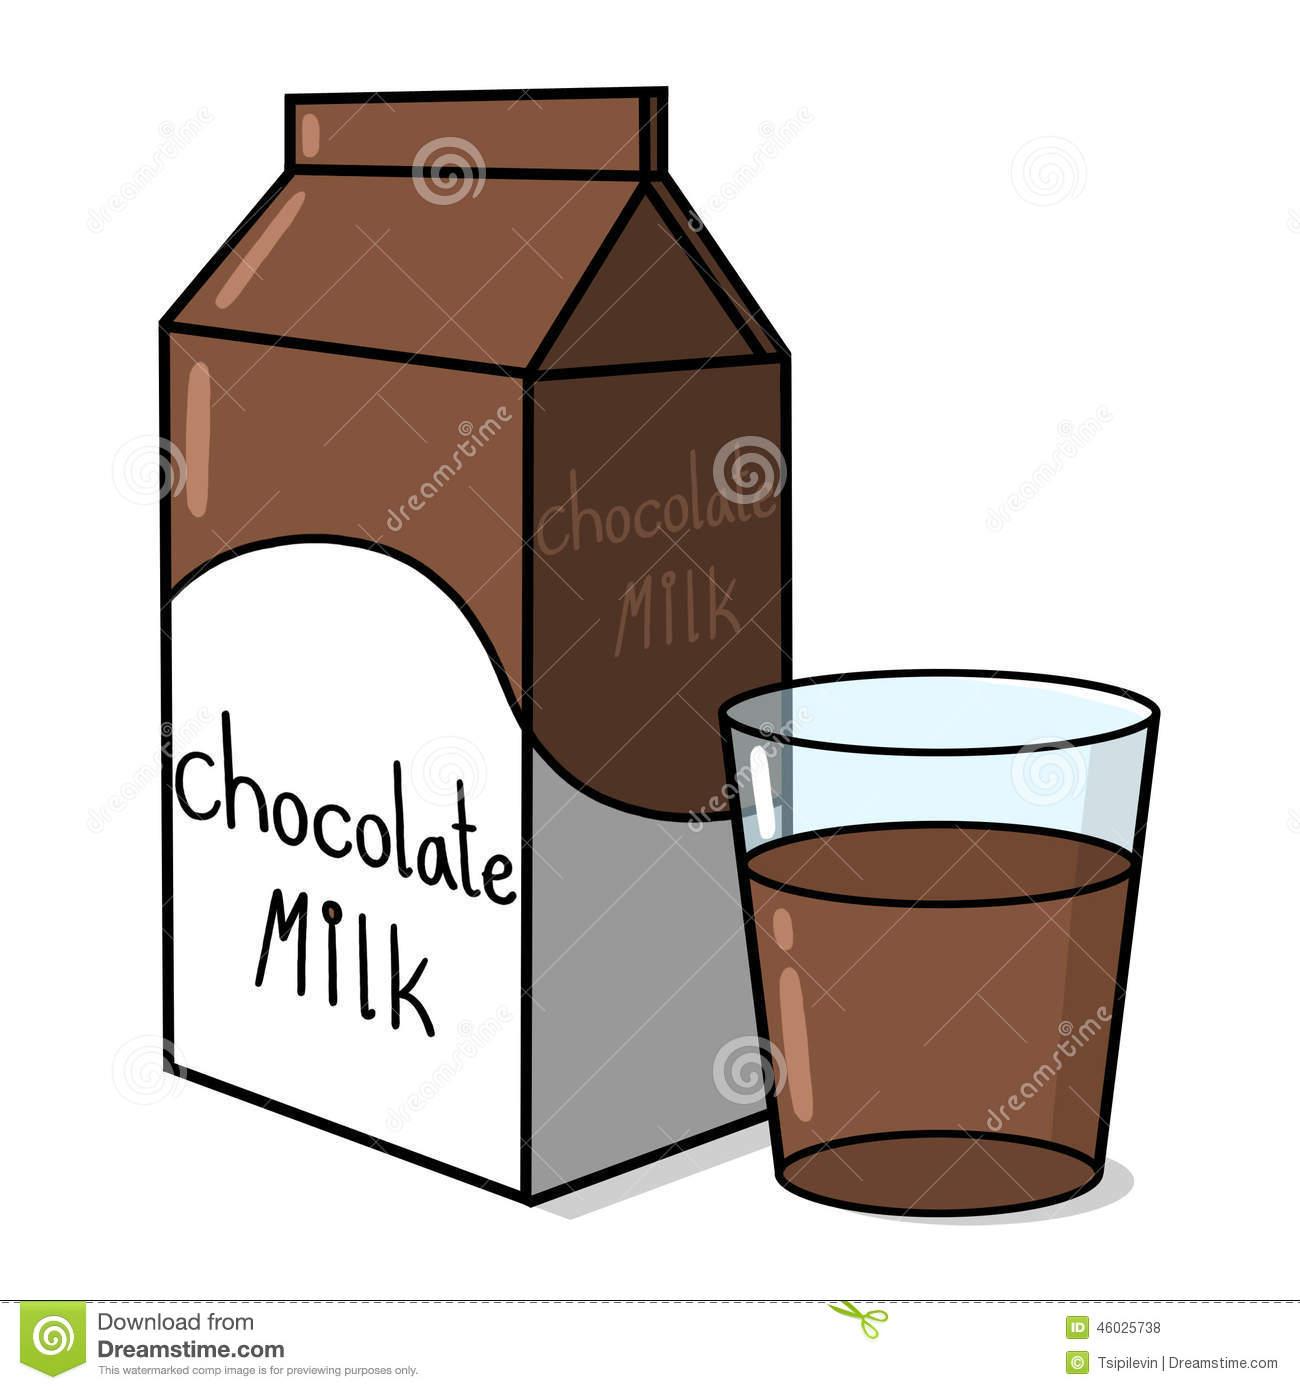 Milk chocolate clipart.